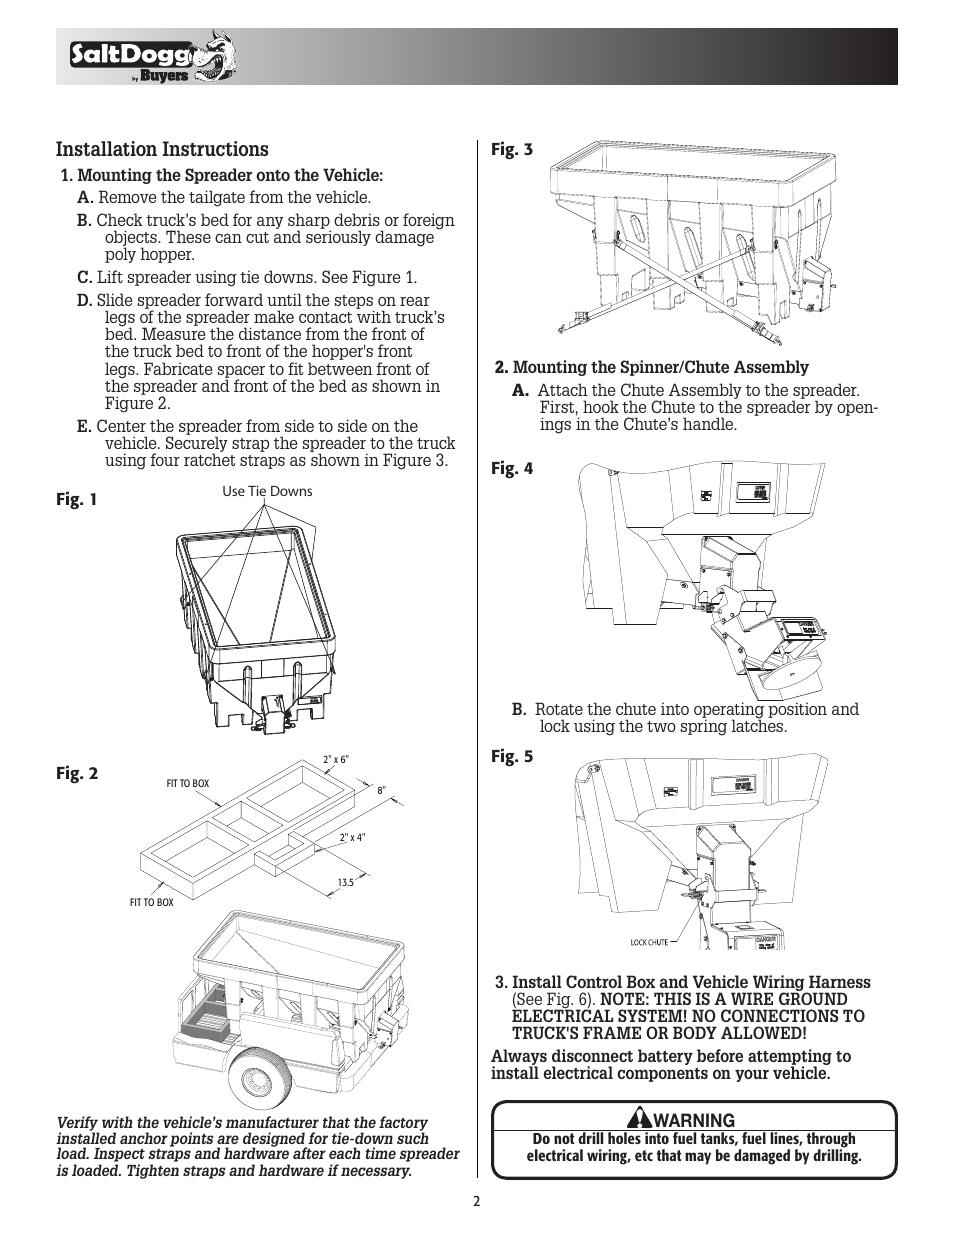 Salt Dogg Controller Wiring Diagram Best Wiring Library